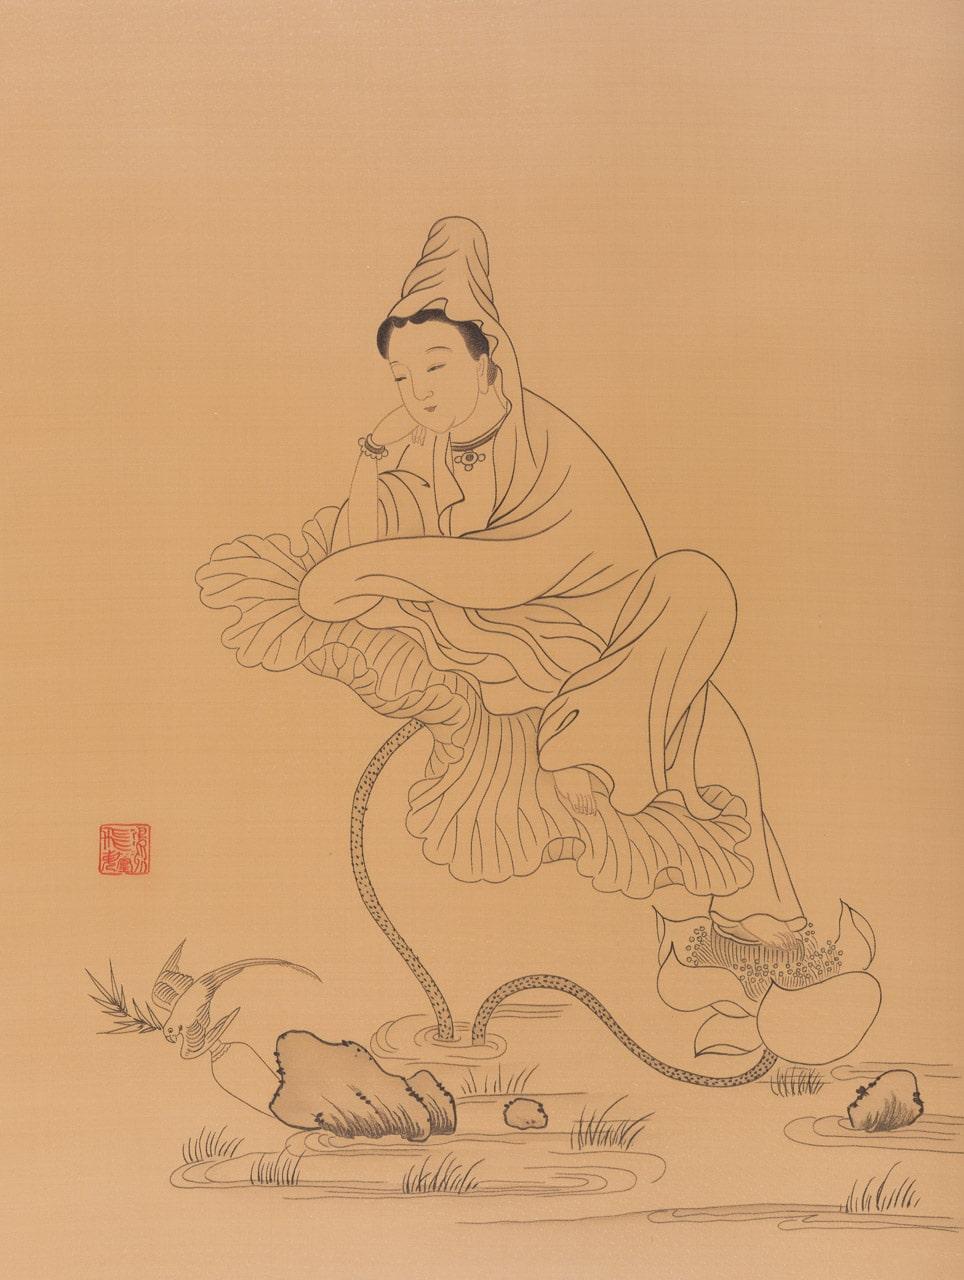 Atop the Lotus